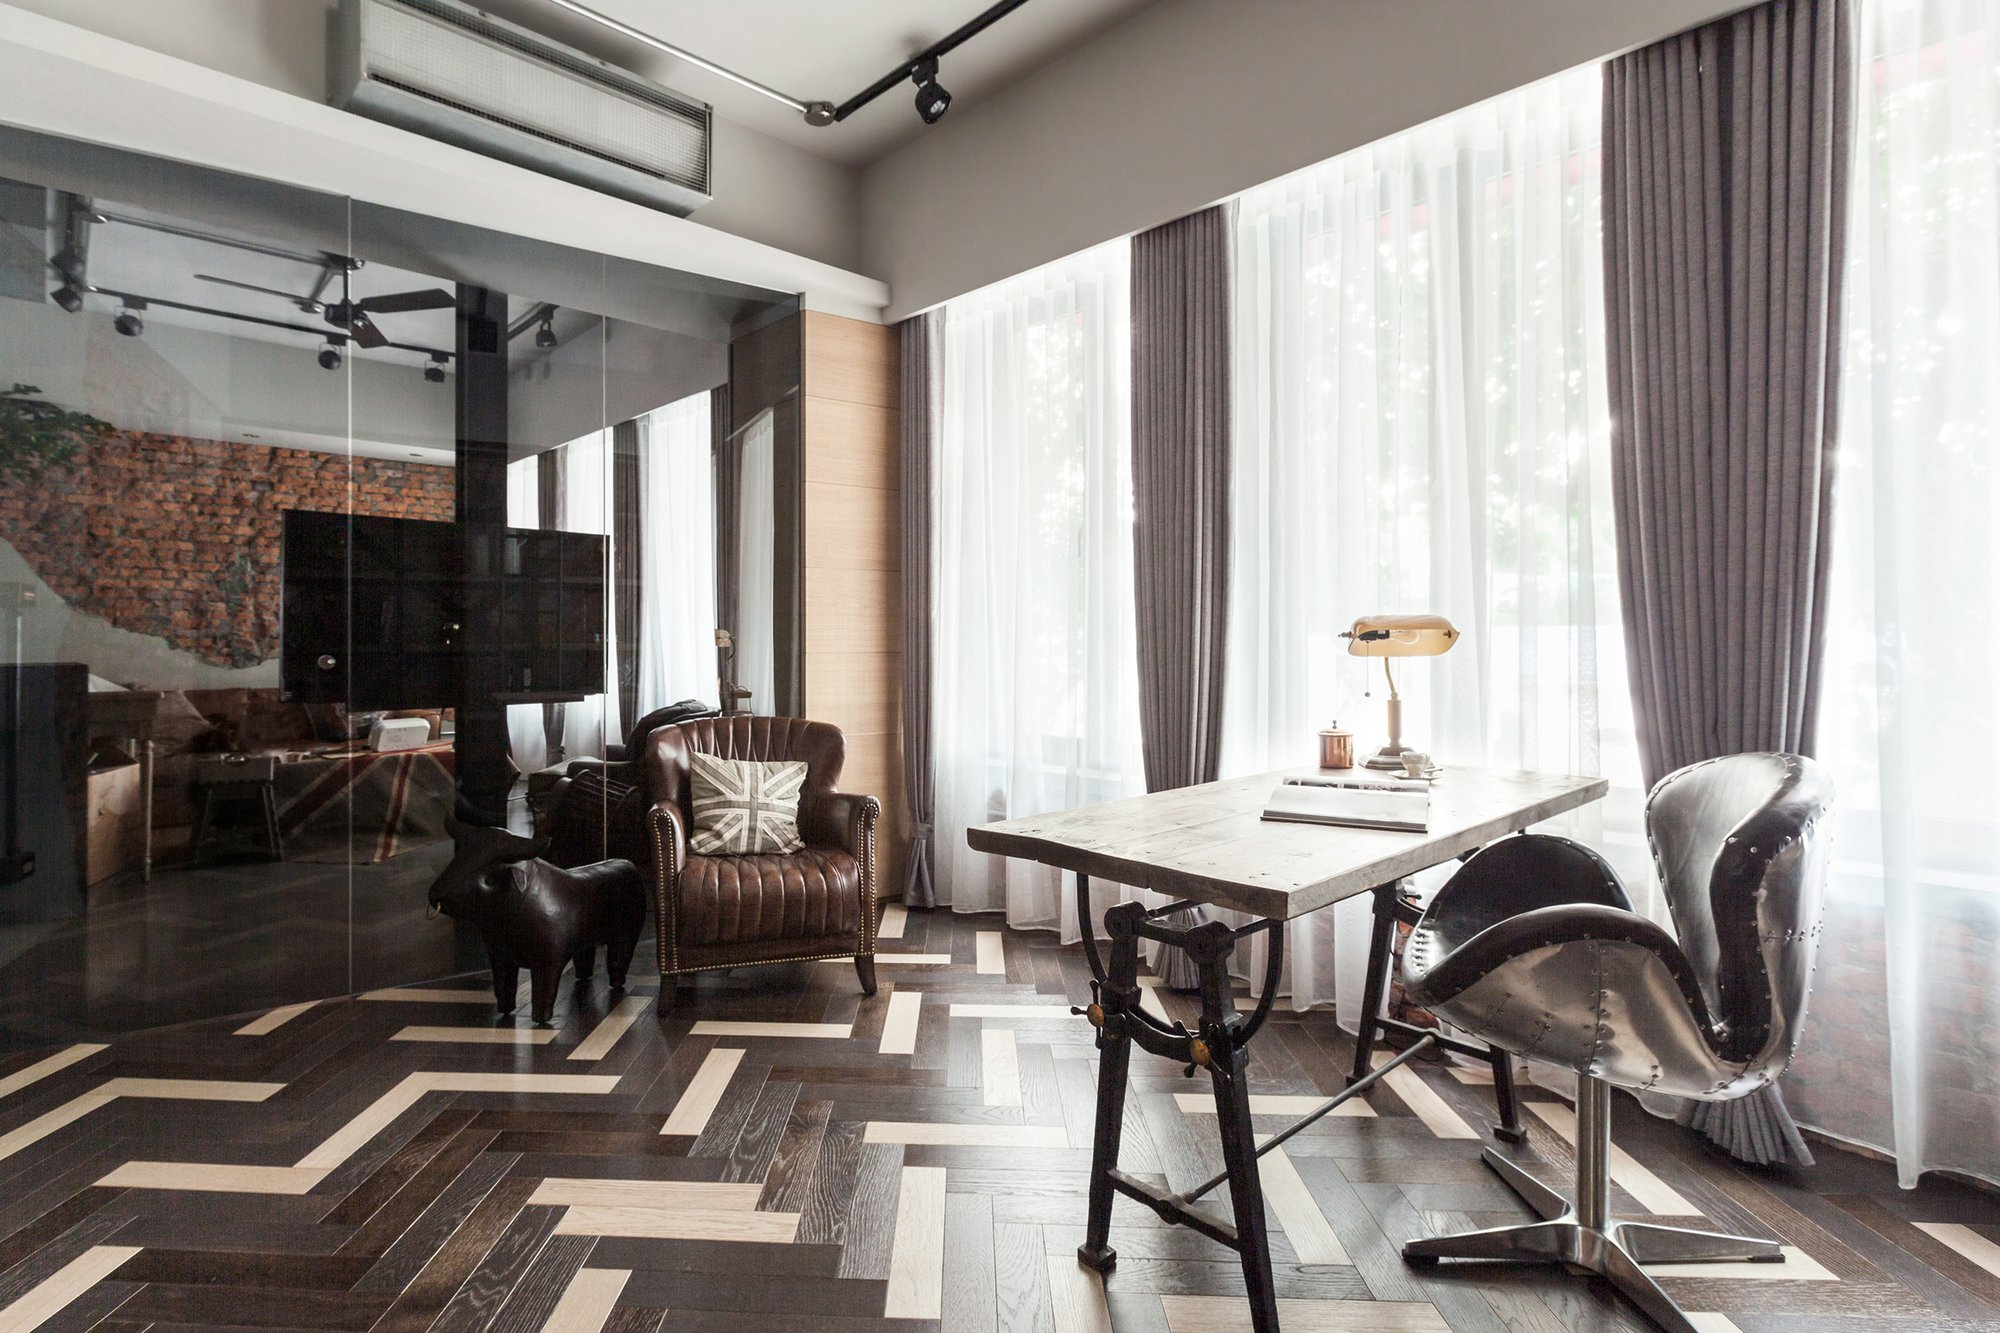 Apartment Refurbishment / CHI-TORCH Interior Design (13)